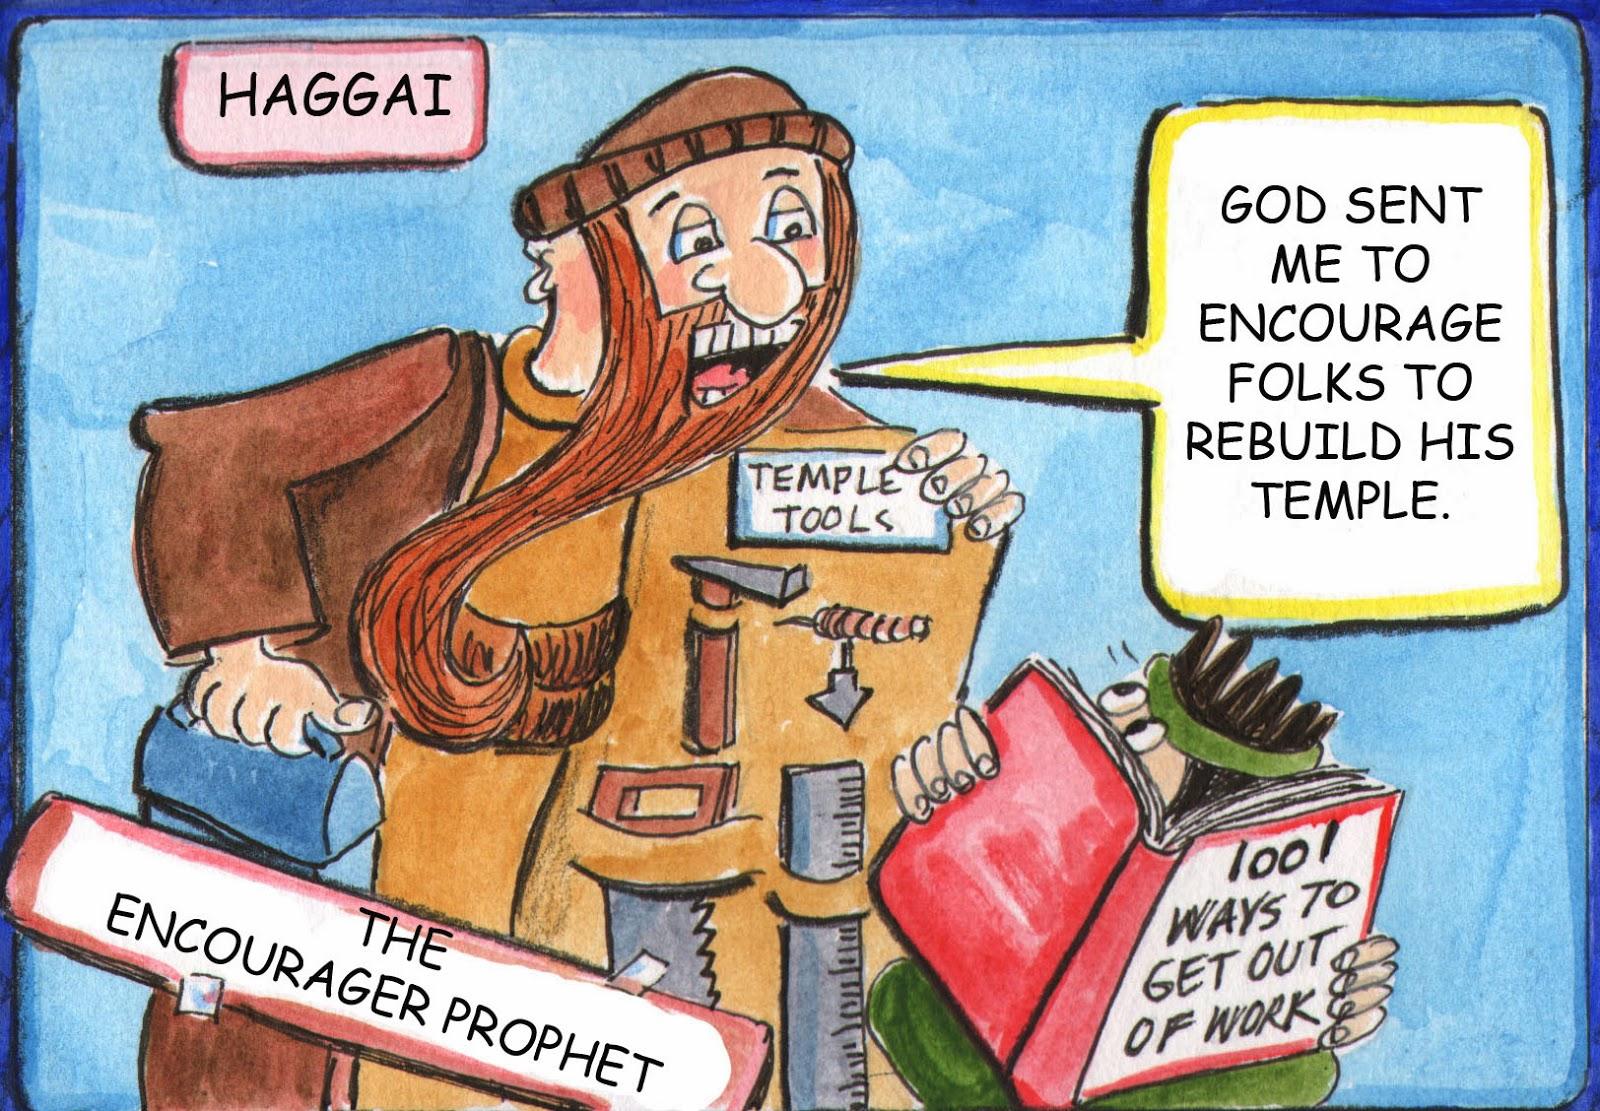 God en gebed december 2013 for Haggai coloring page